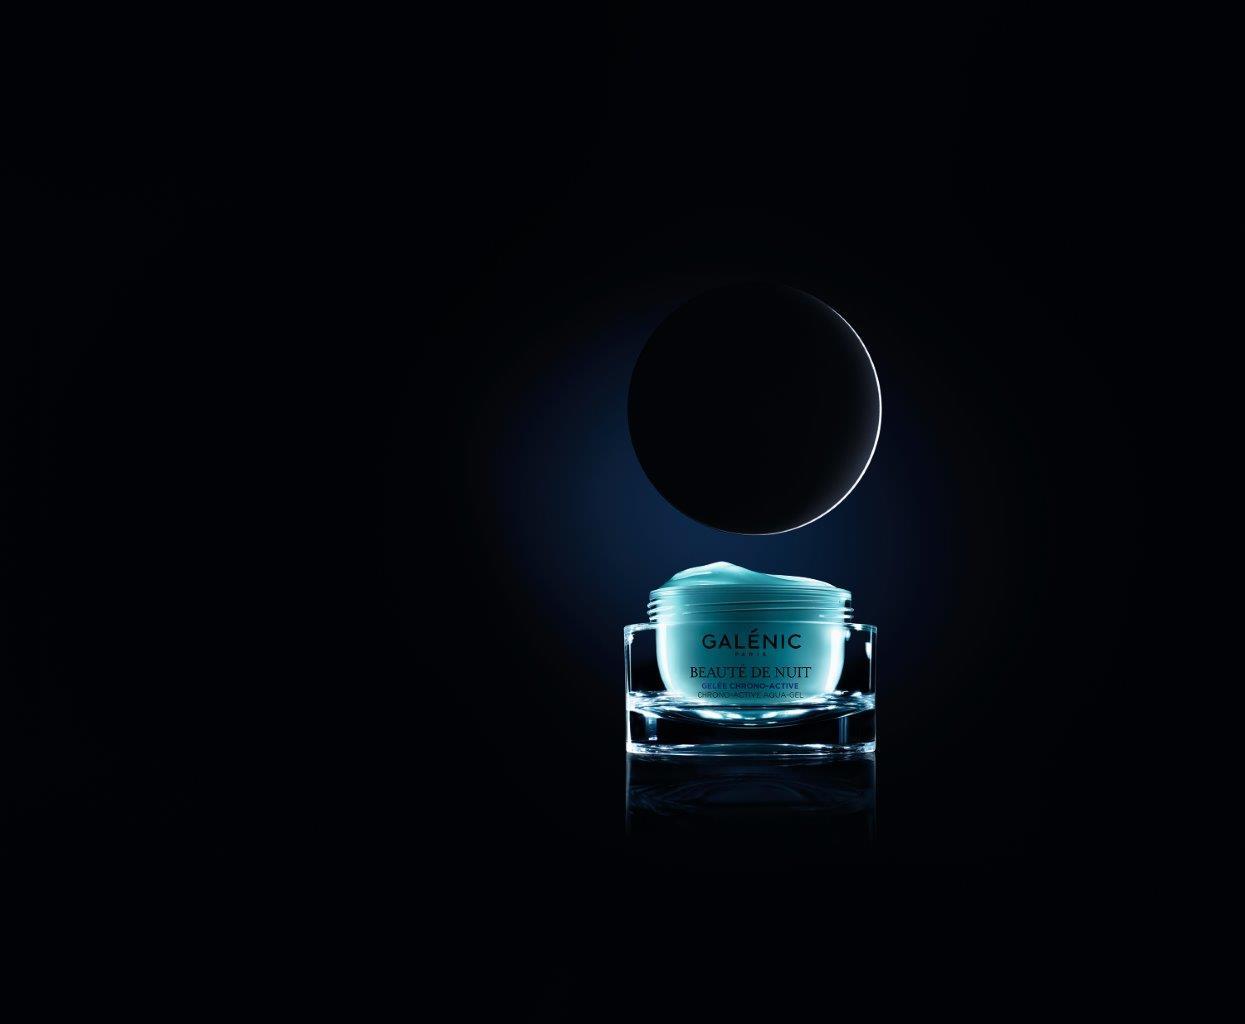 gal nic beaut de nuit el chrono aktywny na noc only you portal dla kobiet uroda moda. Black Bedroom Furniture Sets. Home Design Ideas